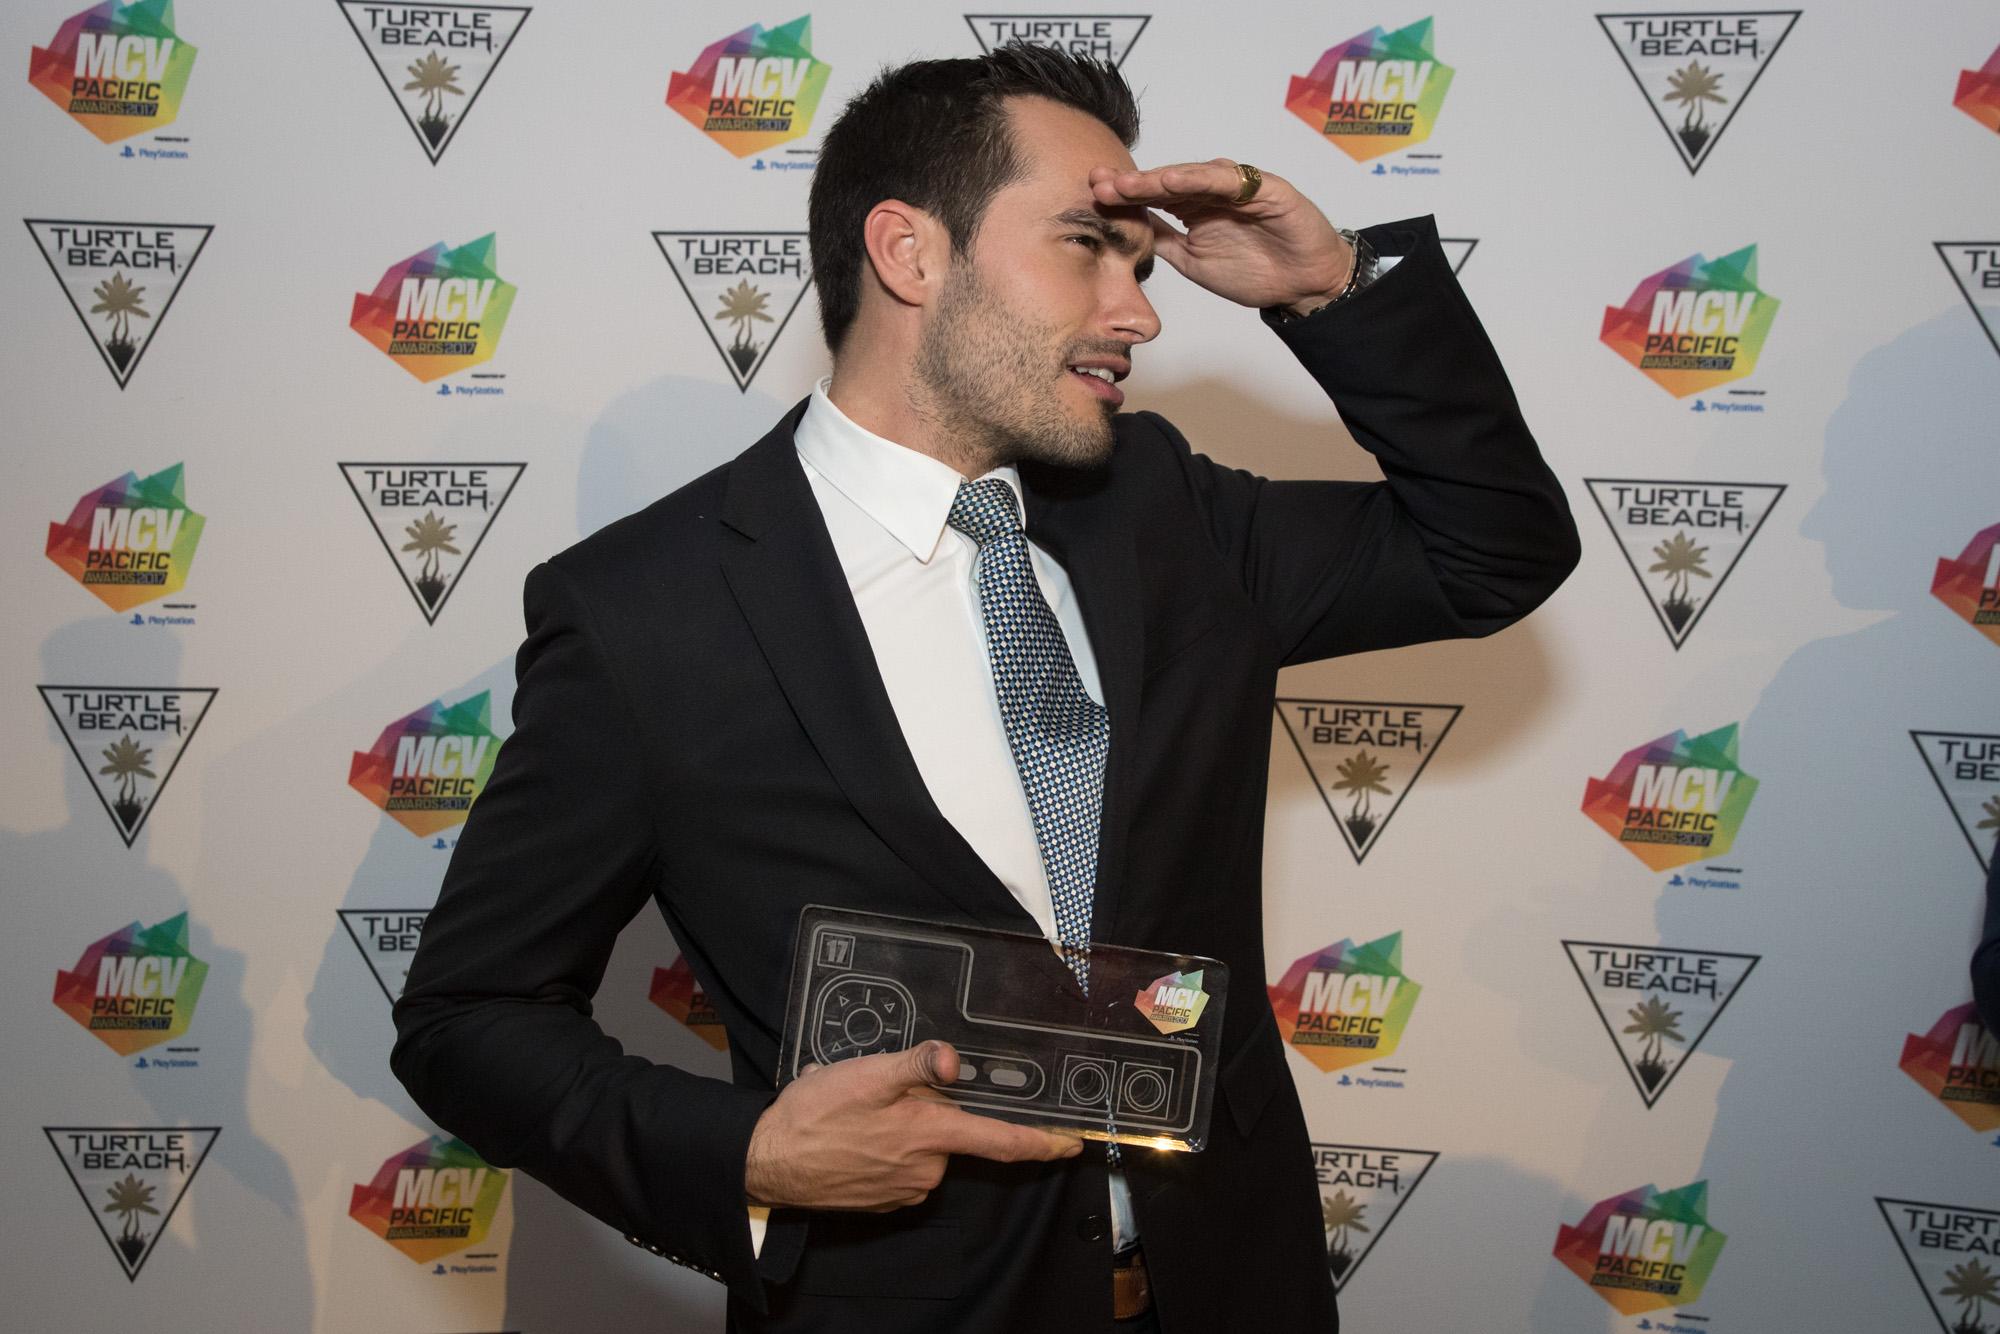 MCV_Pacific_Awards_1_June_17_PS_077.jpg